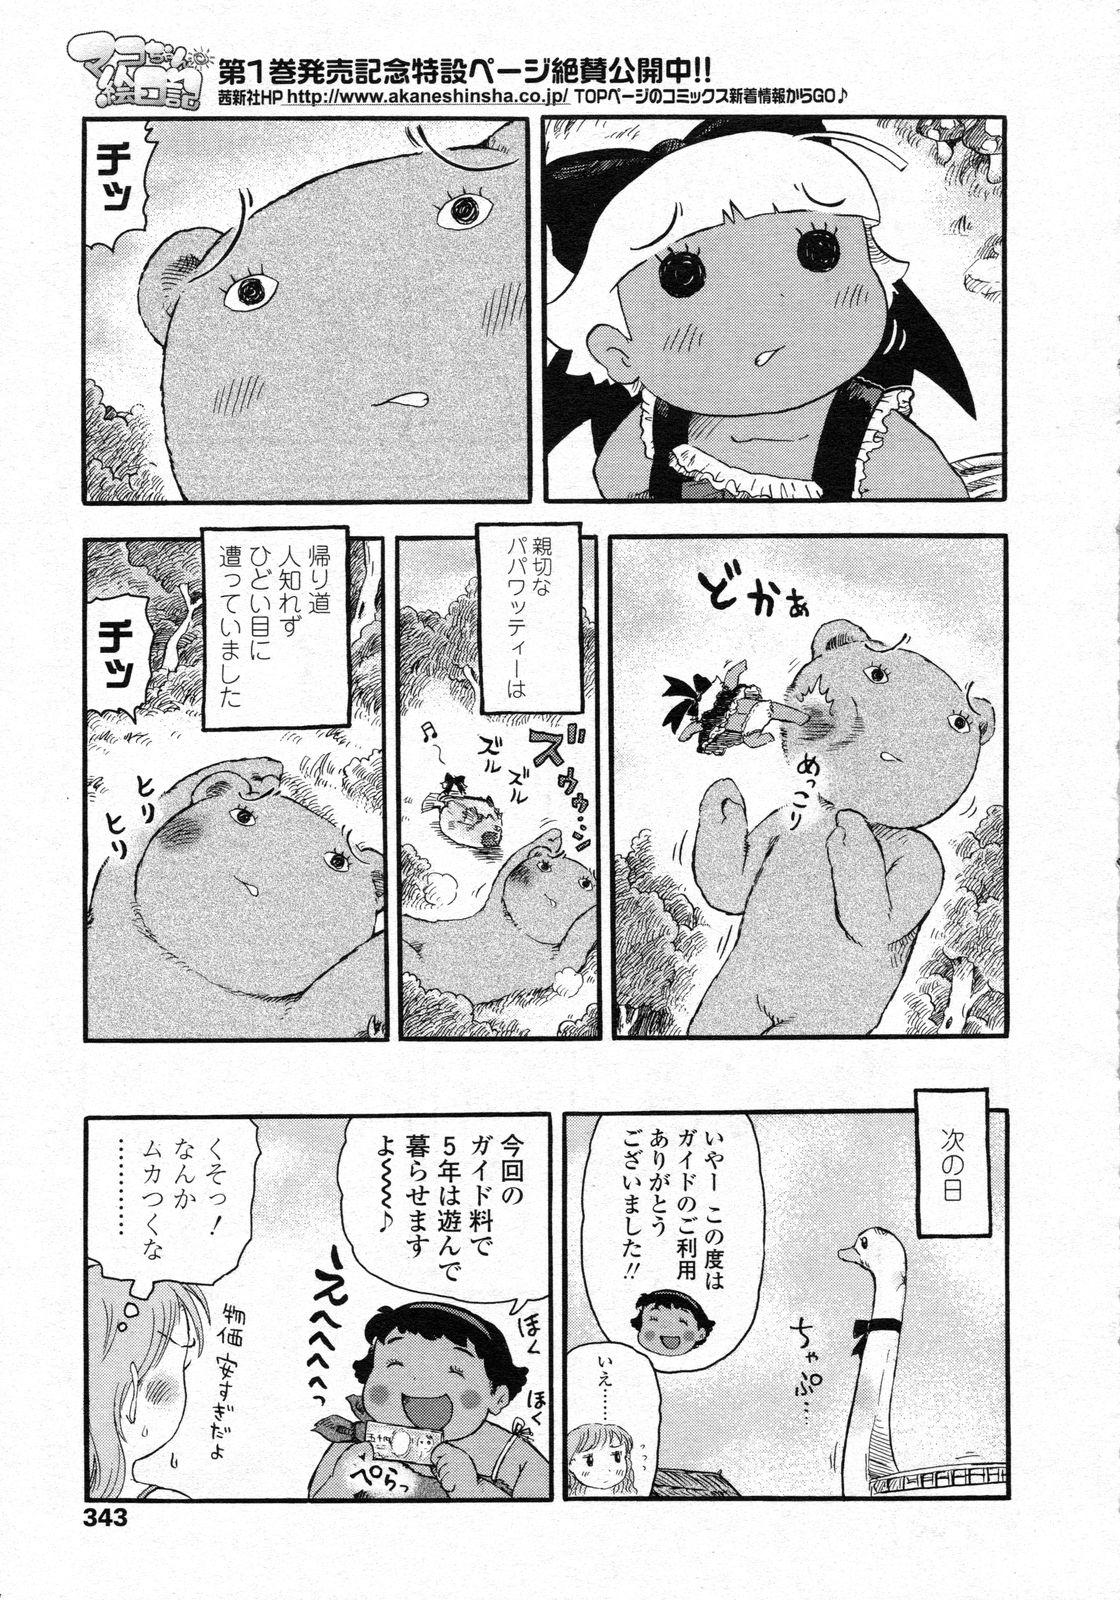 COMIC LO 2009-10 Vol. 67 343